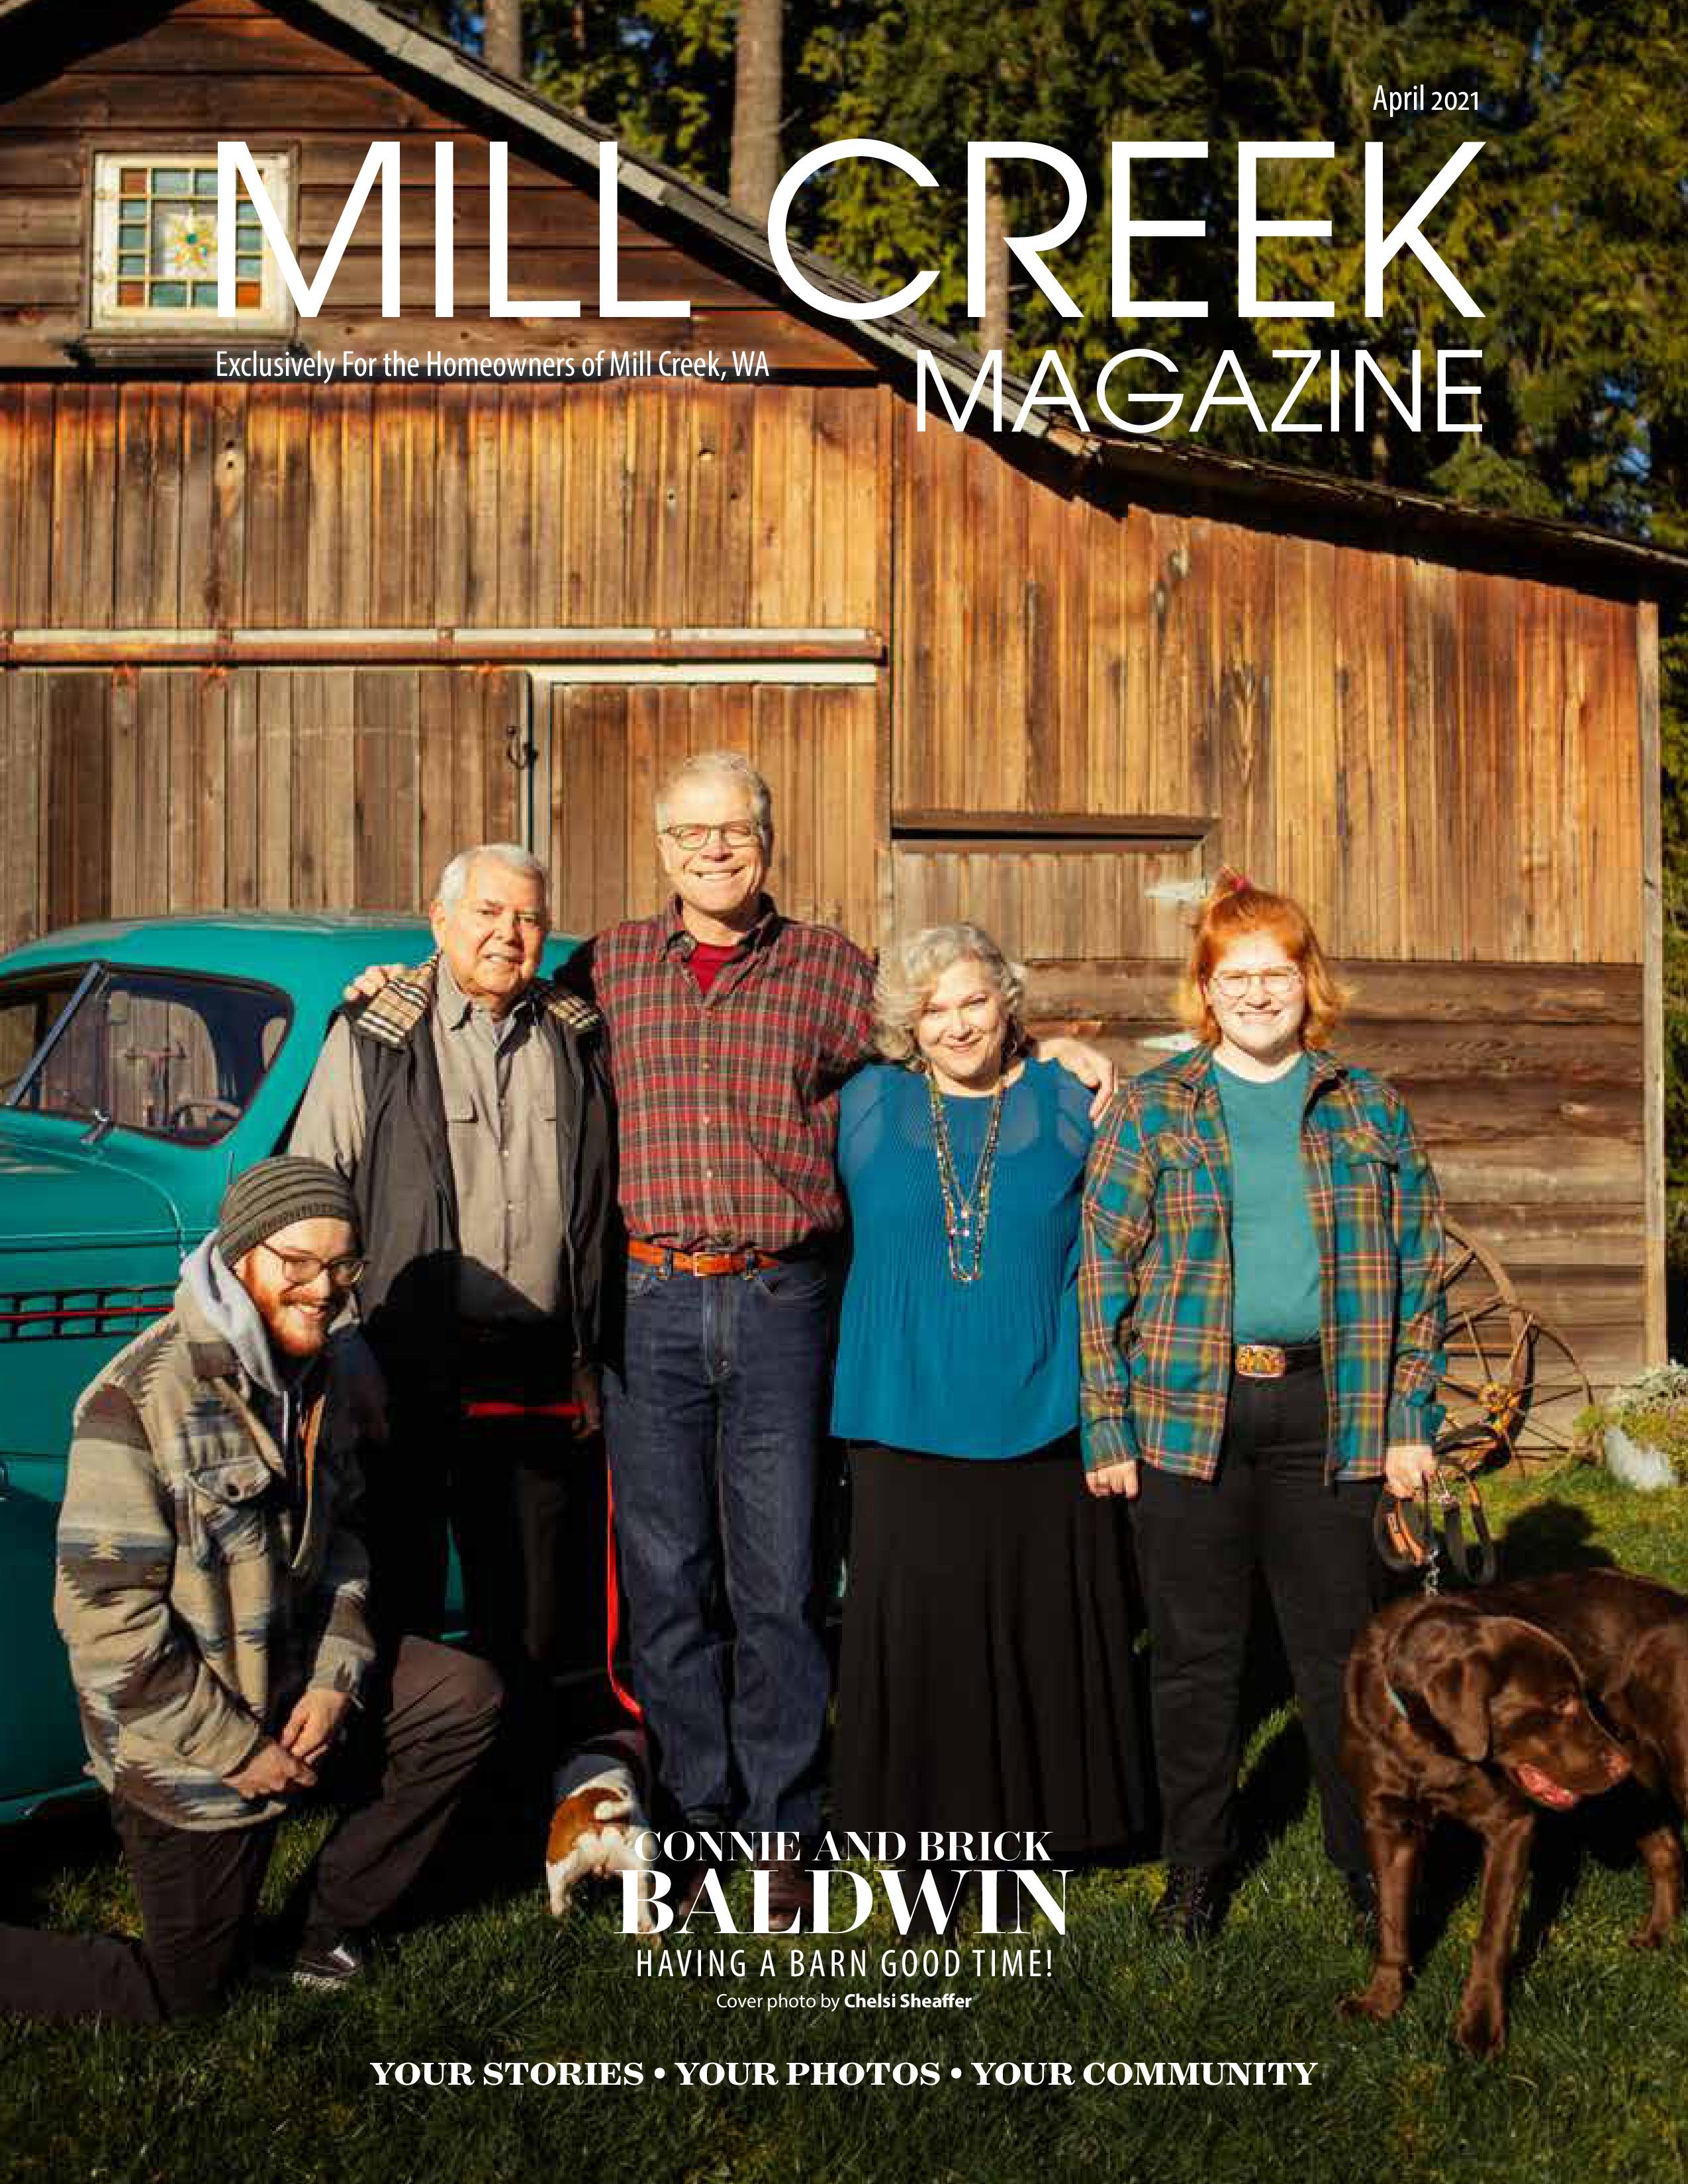 Mill Creek Magazine 2021-04-01